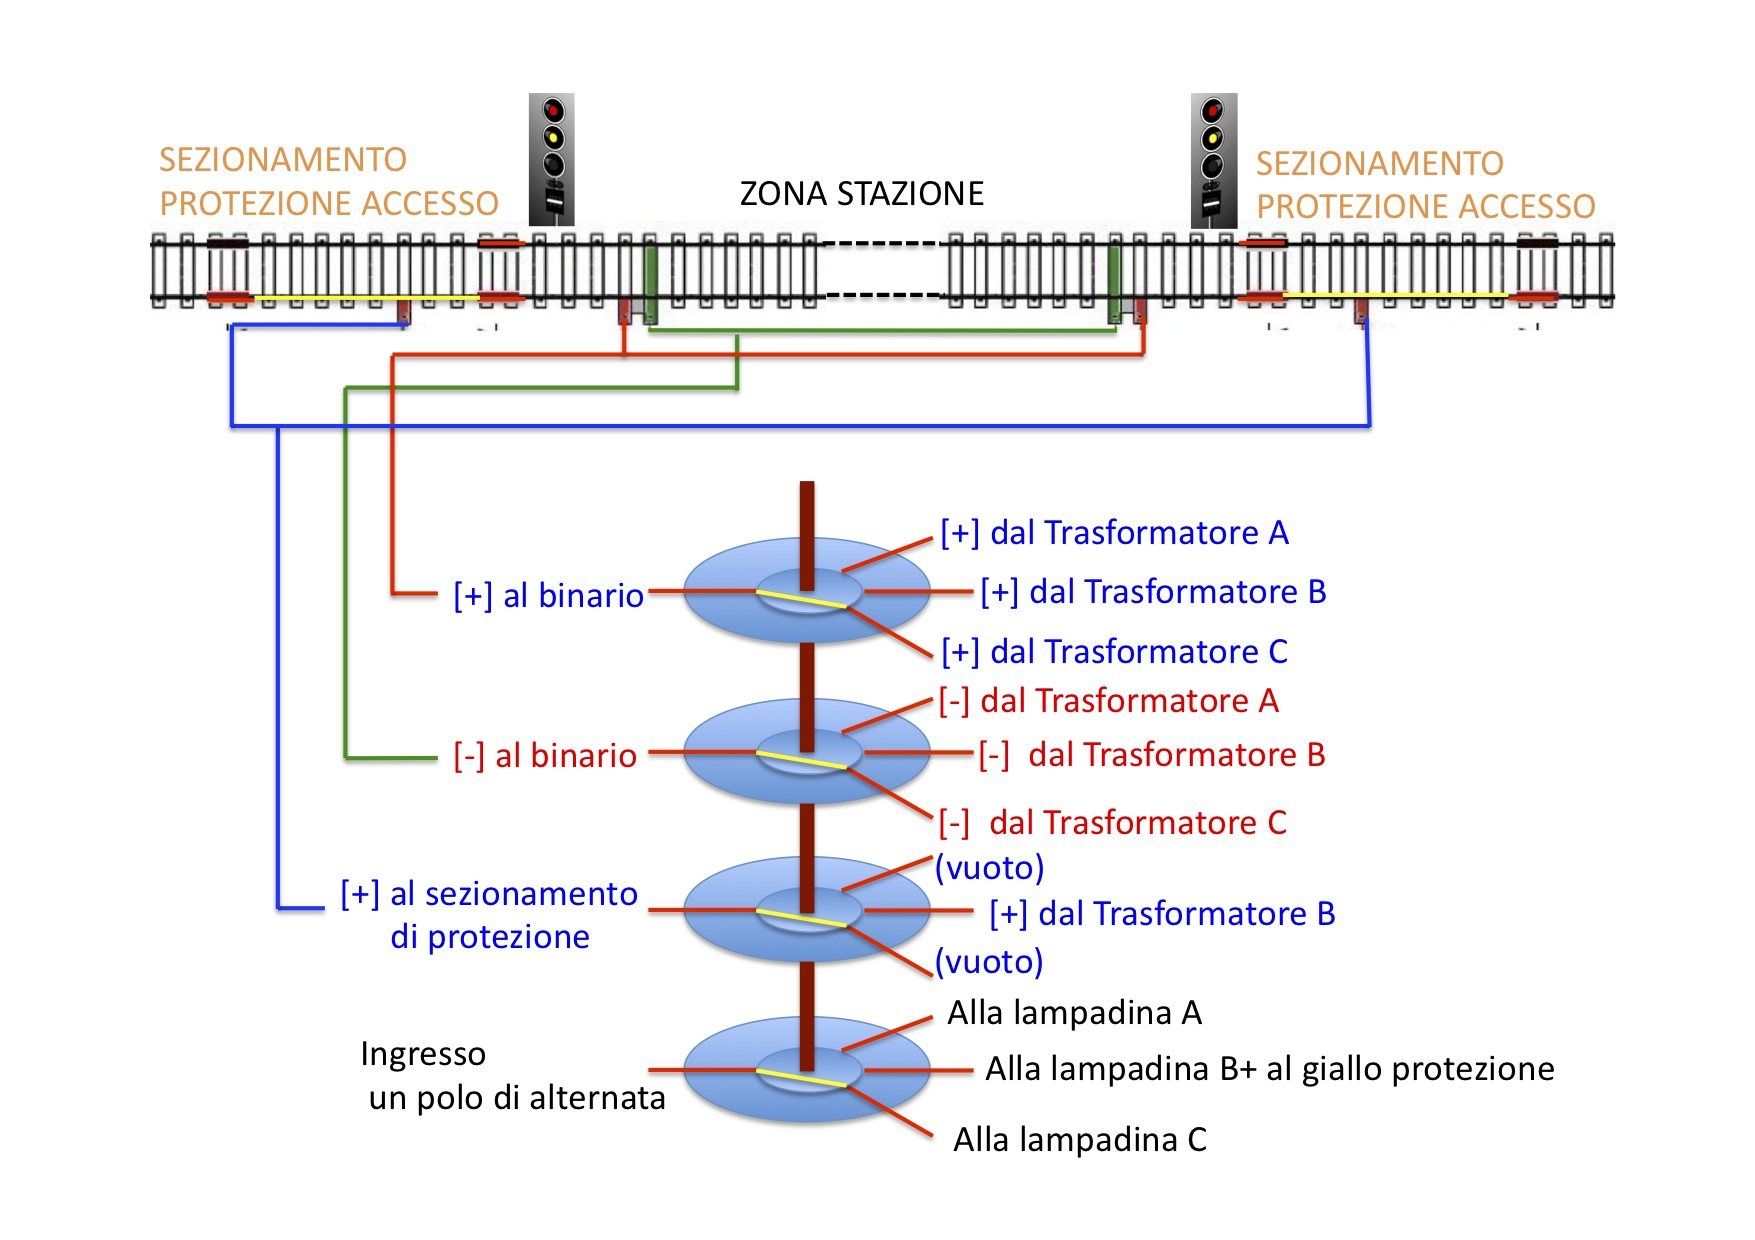 Schemi Elettrici Treni : Gestione elettrica di una stazione complessa tramite